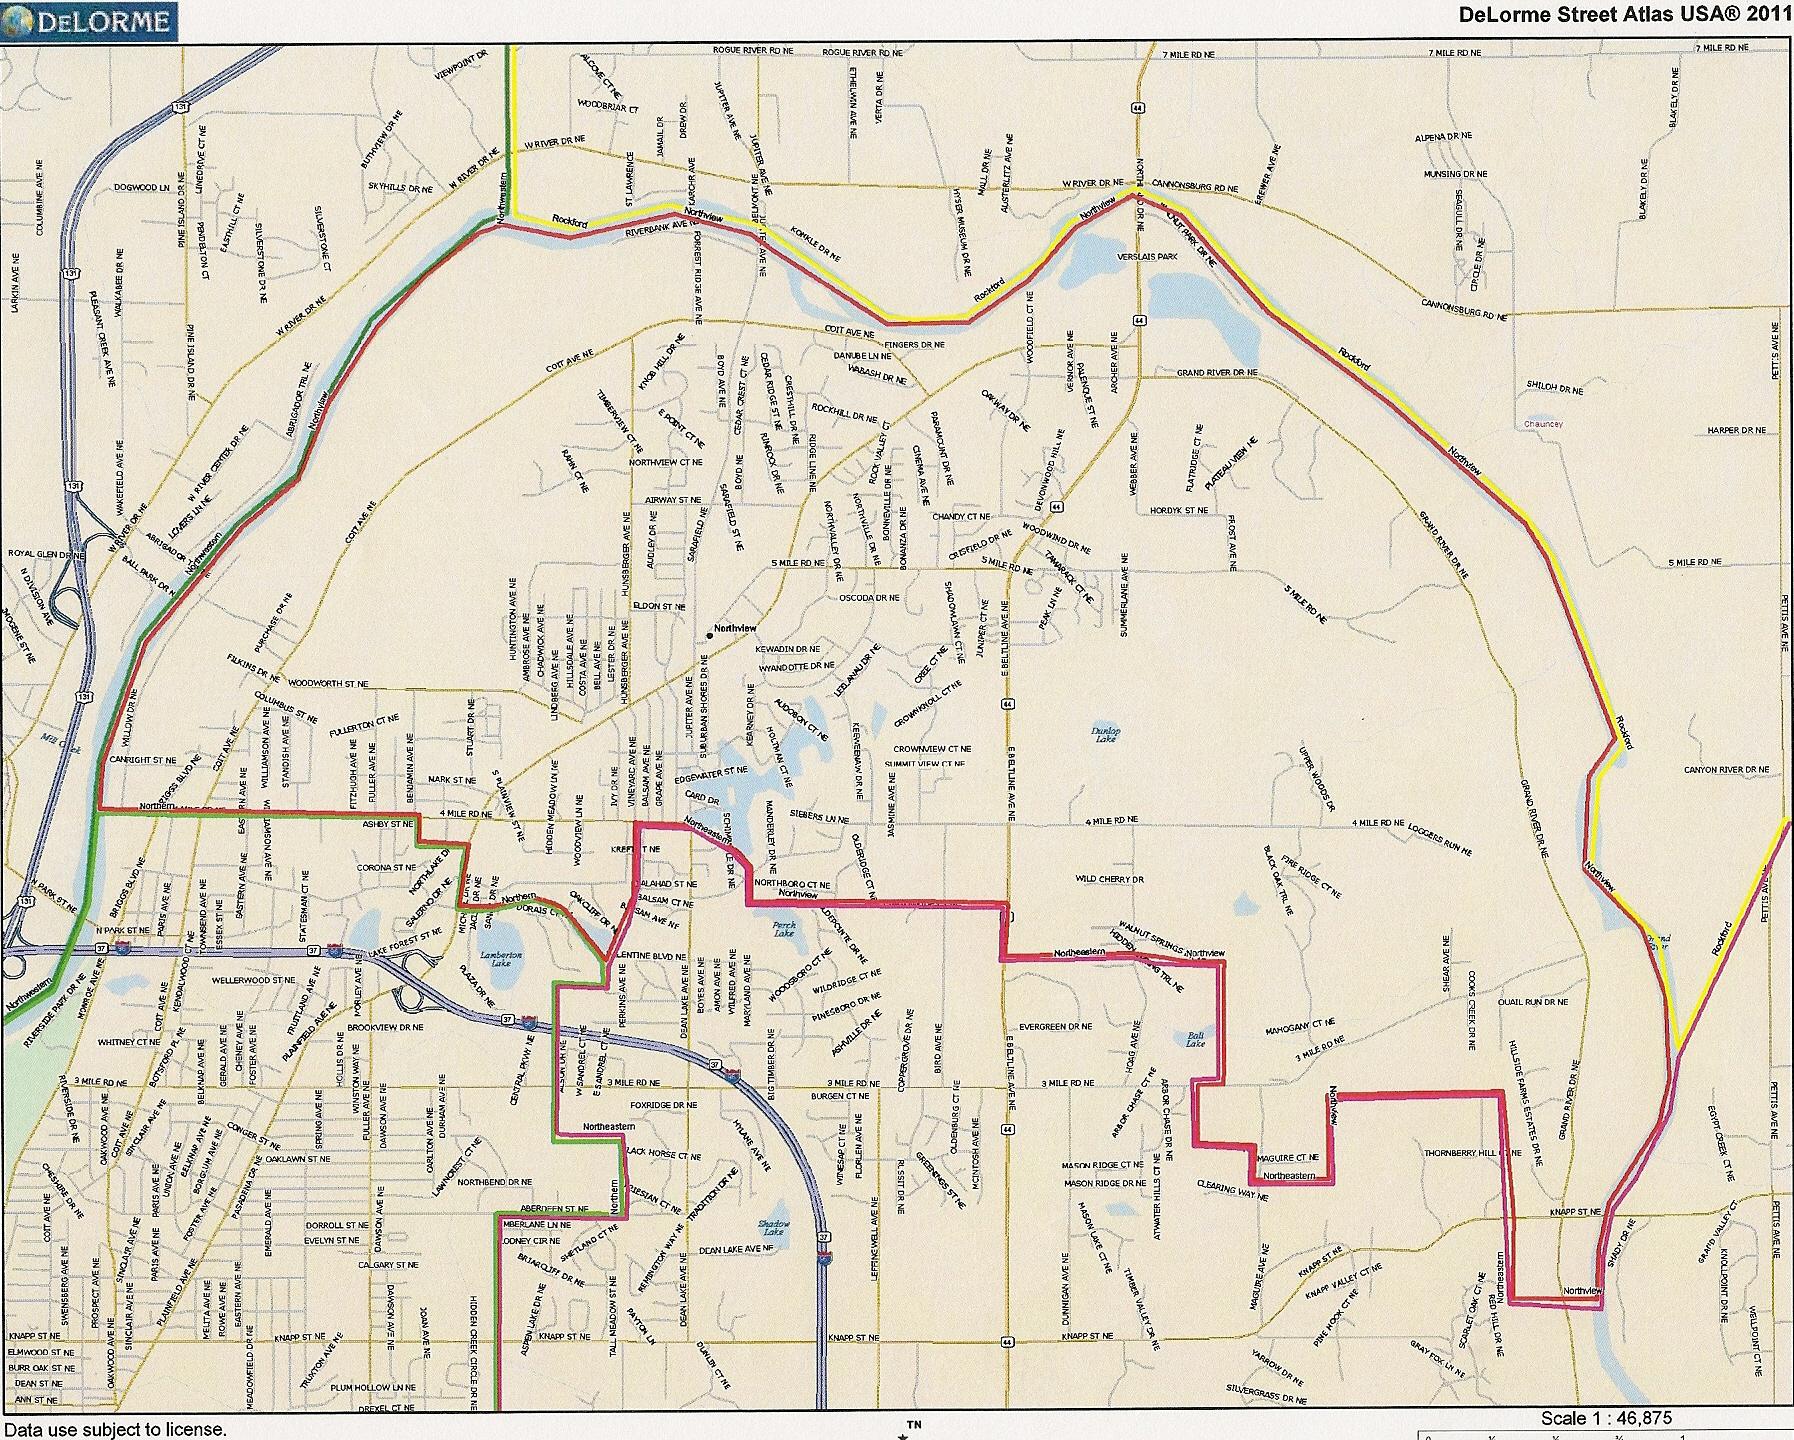 Doents | Northview Little League on encephalitis map, aphasia map, canavan disease map, stroke map, wound map, myofascial pain map, delirium map, influenza map, dark skies map, dengue fever map,